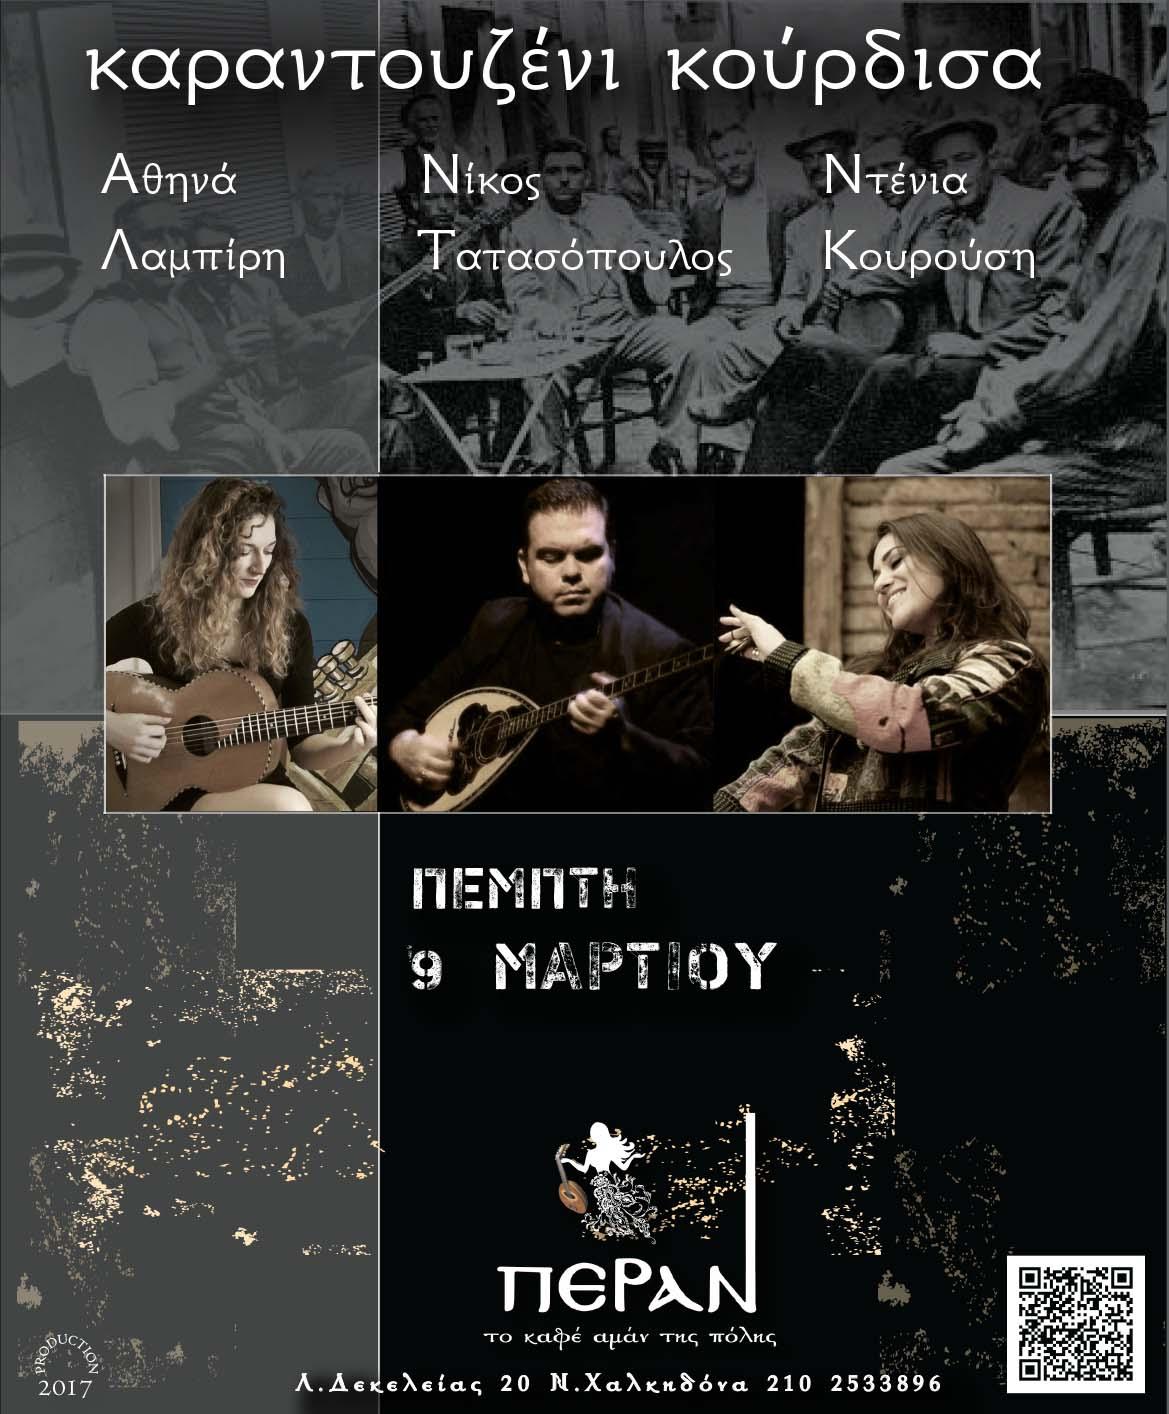 TATASOPOYLOS-KOYROYSI 9-3